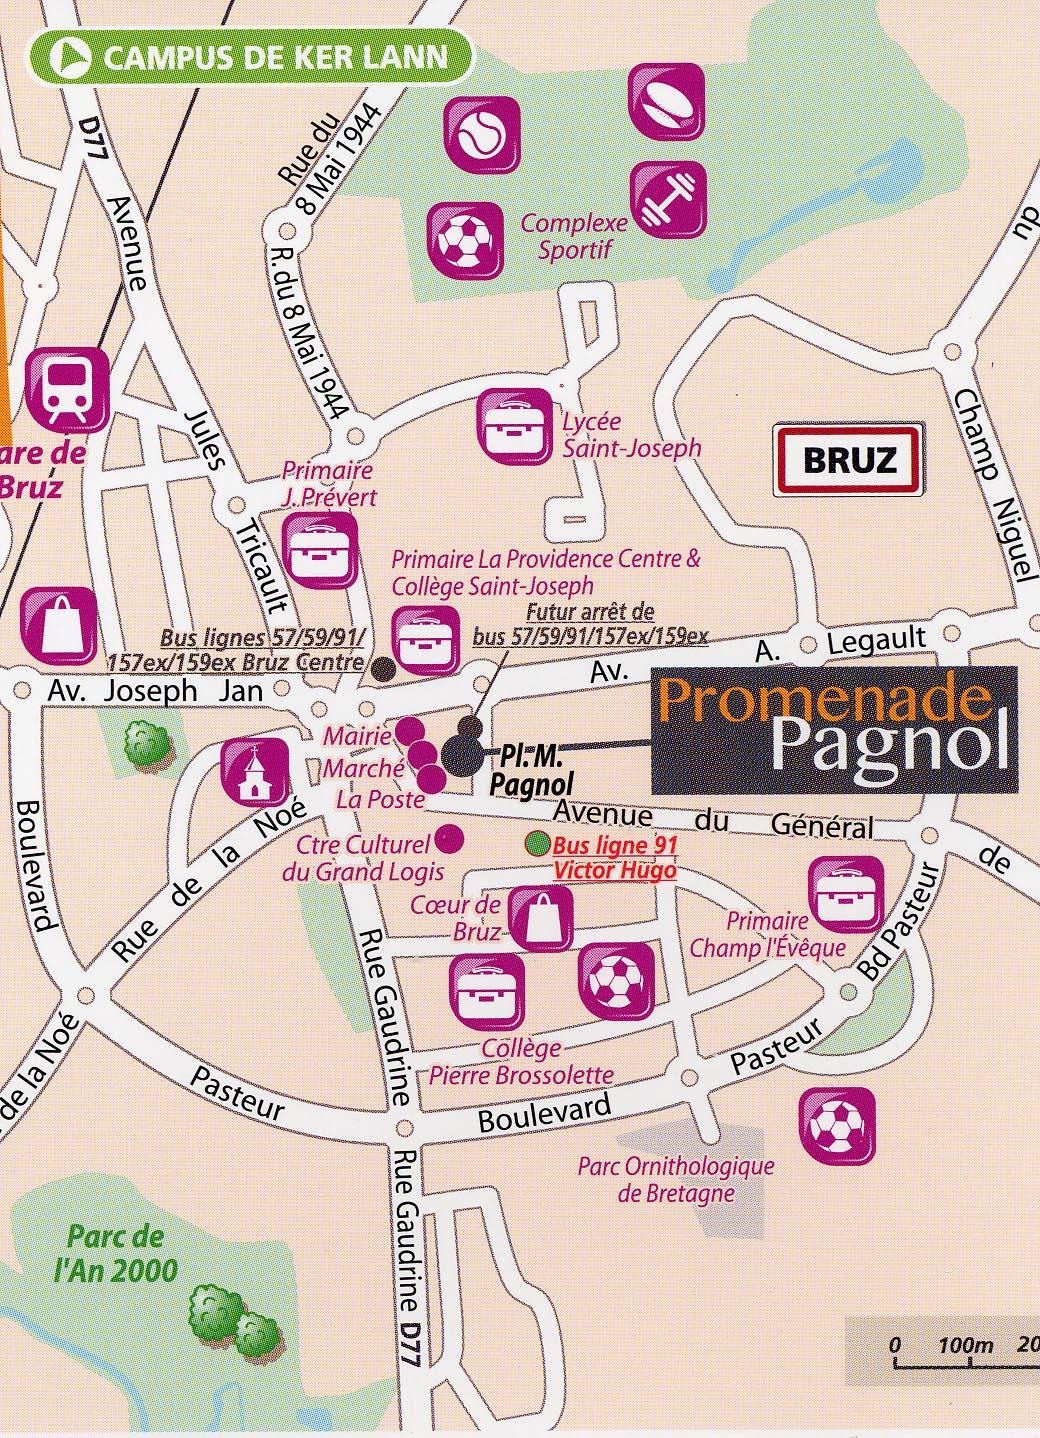 Promenade Pagnol - Photo 4